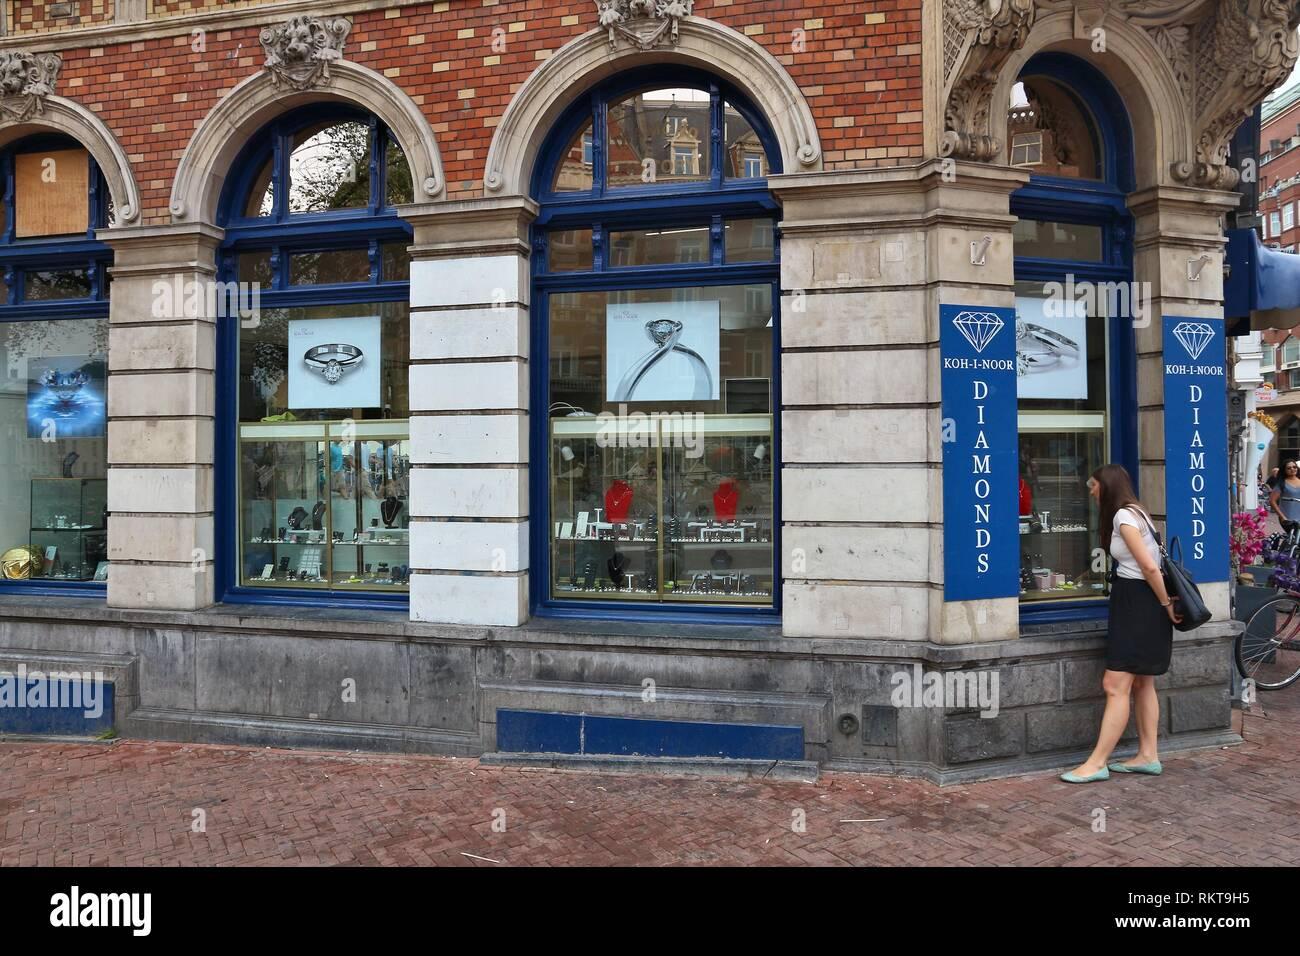 AMSTERDAM, NETHERLANDS - JULY 8, 2017: Diamond shop of Koh-I-Noor Diamonds in Amsterdam, Netherlands. Amsterdam has a long history of diamond trade an - Stock Image